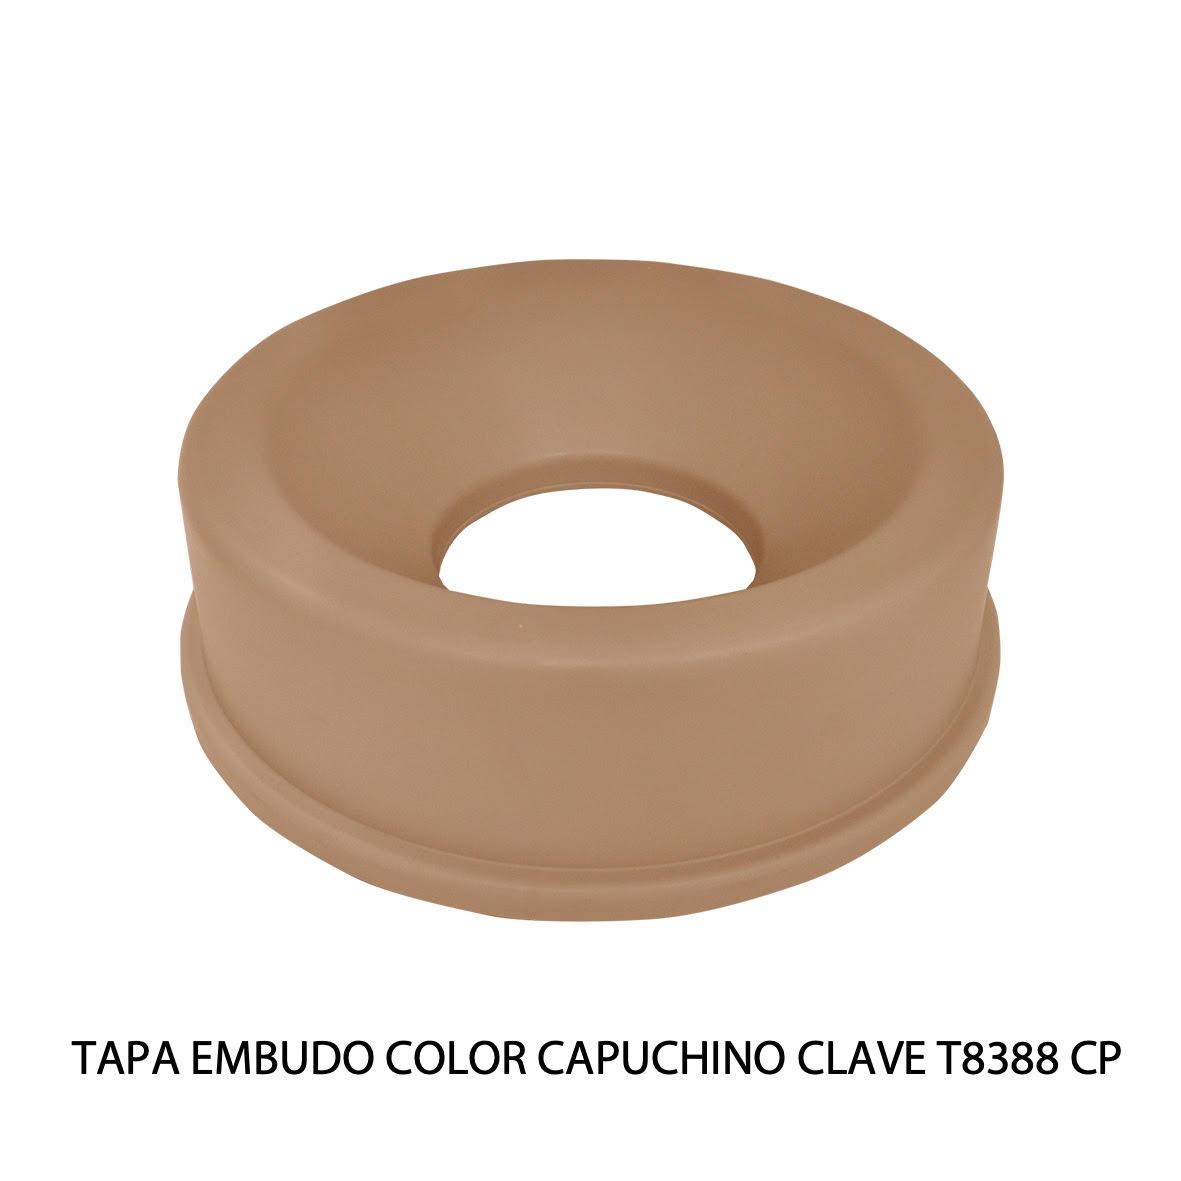 Tapa embudo color Capuchino clave T8388 CP de Sablón